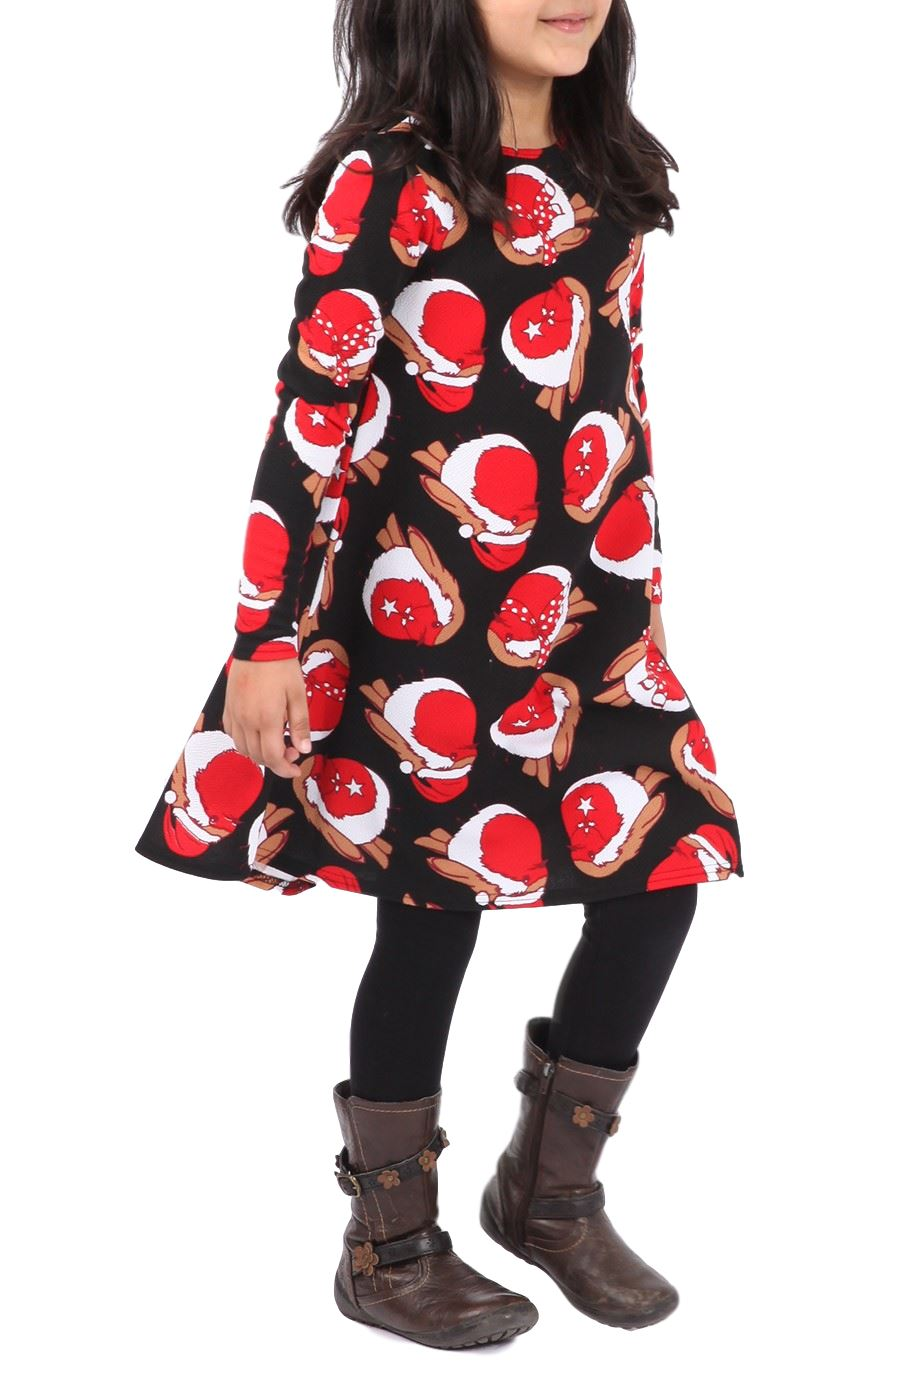 Dress up xmas party - Kids Girls Dress Up Christmas Xmas Party Swing